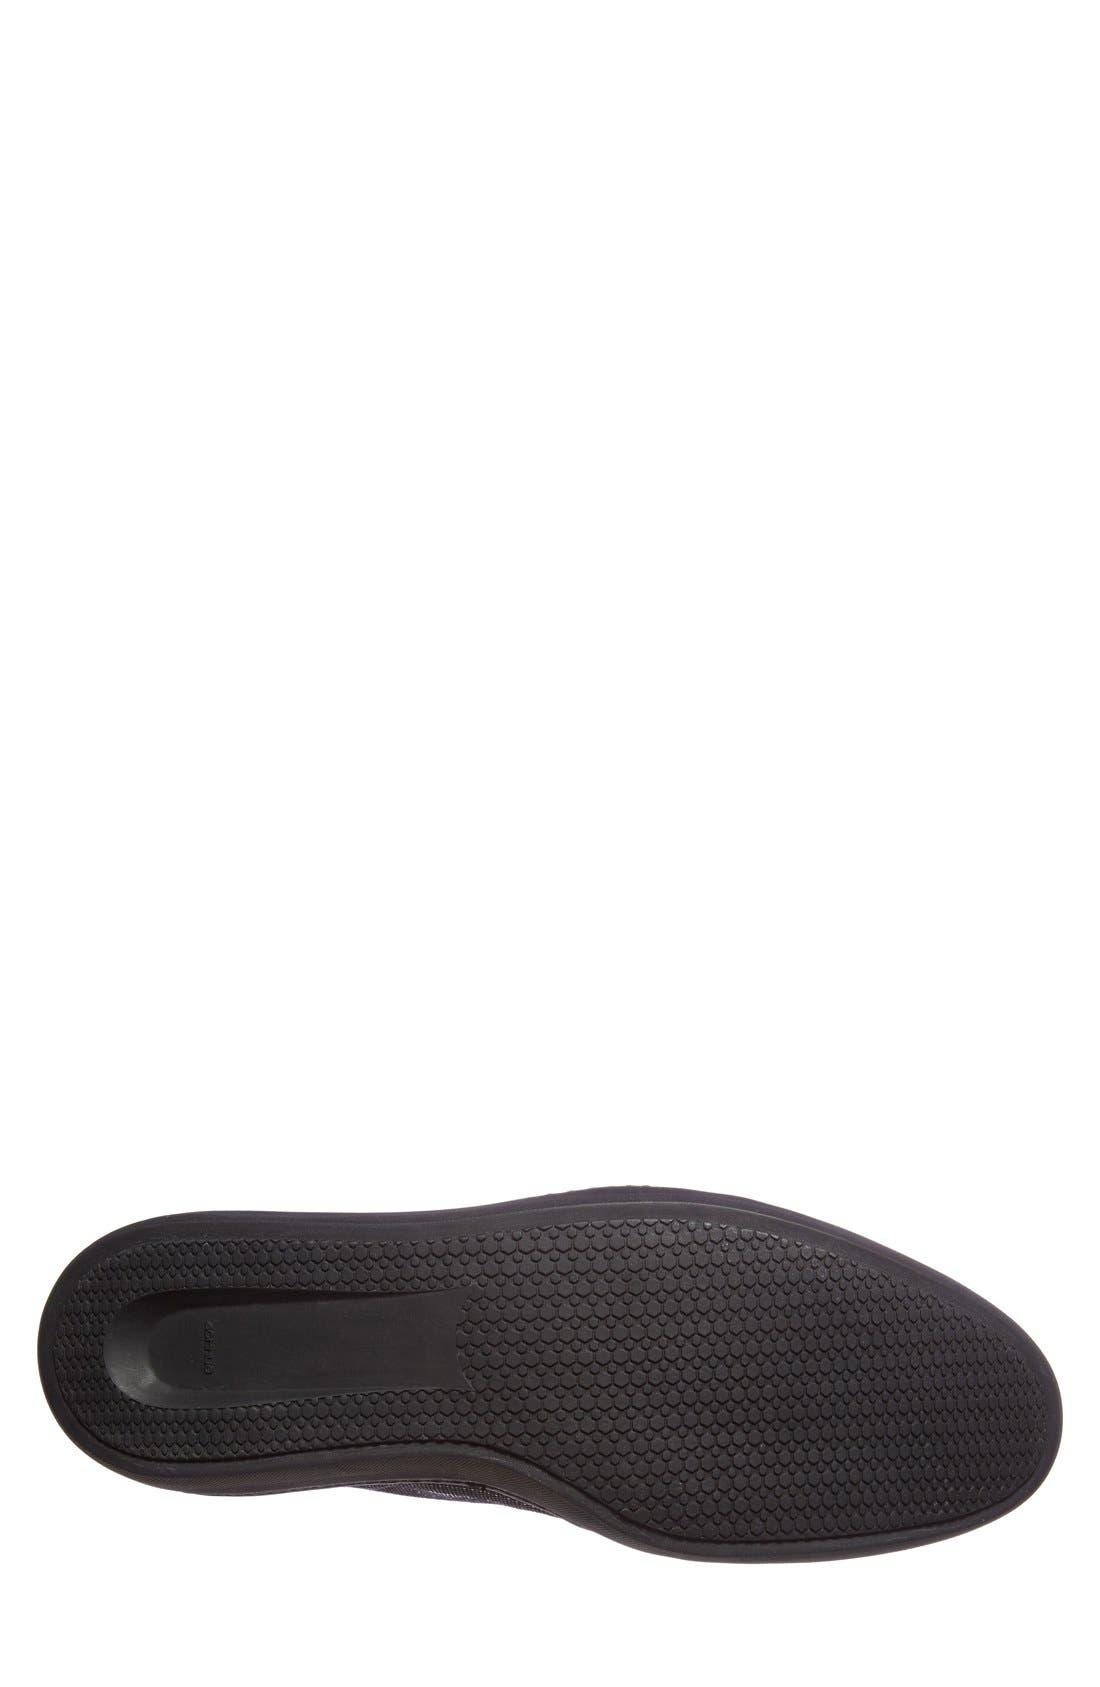 'Bordeau' Sneaker,                             Alternate thumbnail 4, color,                             Black